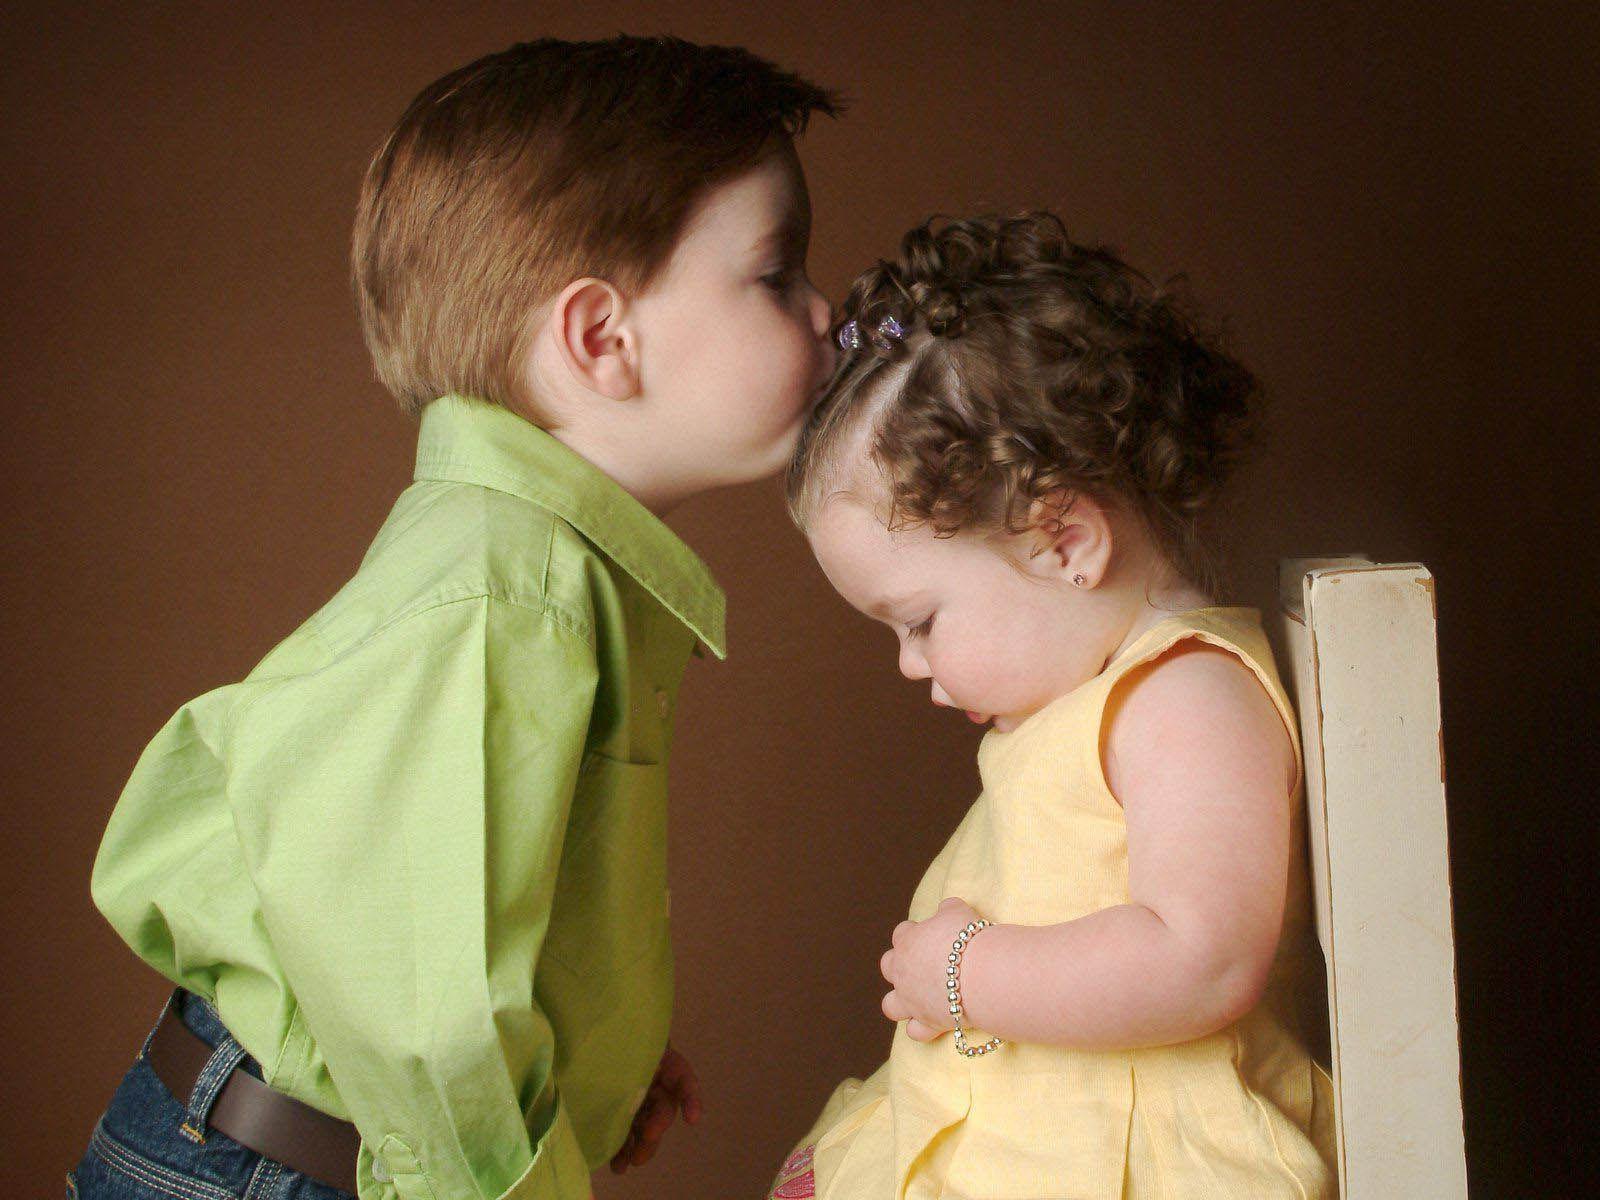 Download Emo Boy And Girl Kissing Wallpaper Hd Free Cute -6714